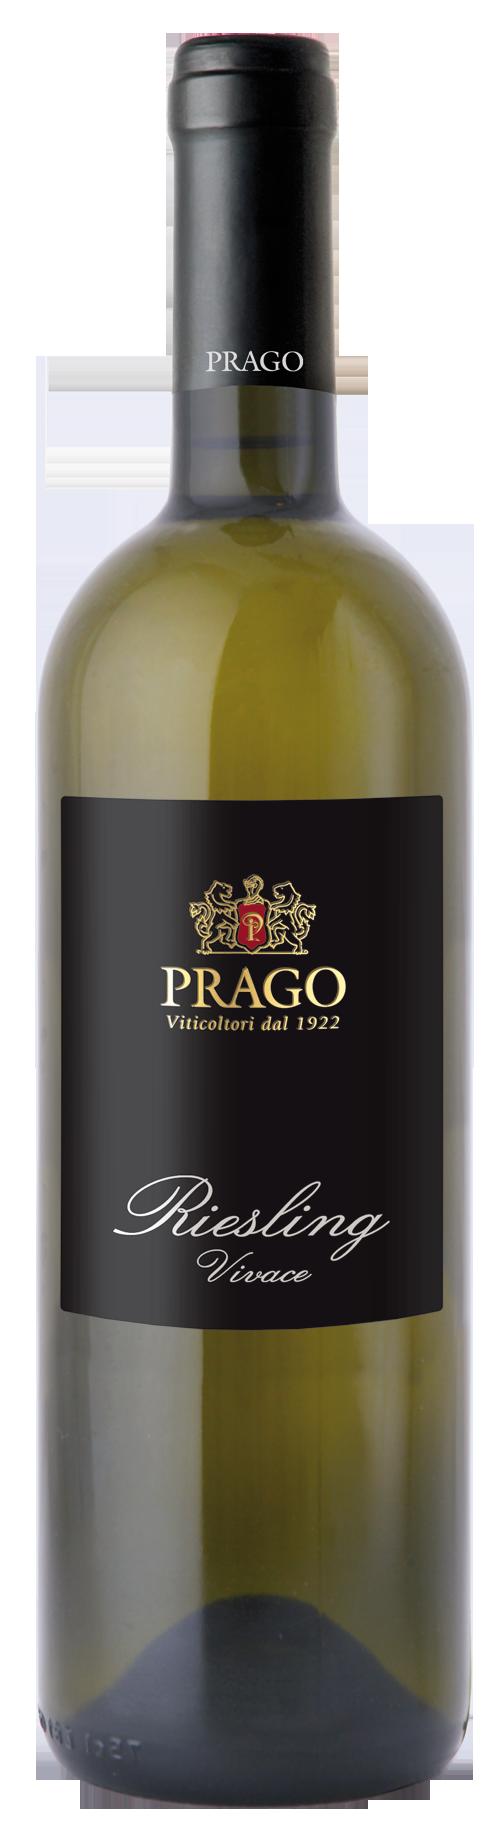 PRAGO Vini e Spumanti Oltrepò Pavese - Vini Vivaci - Riesling